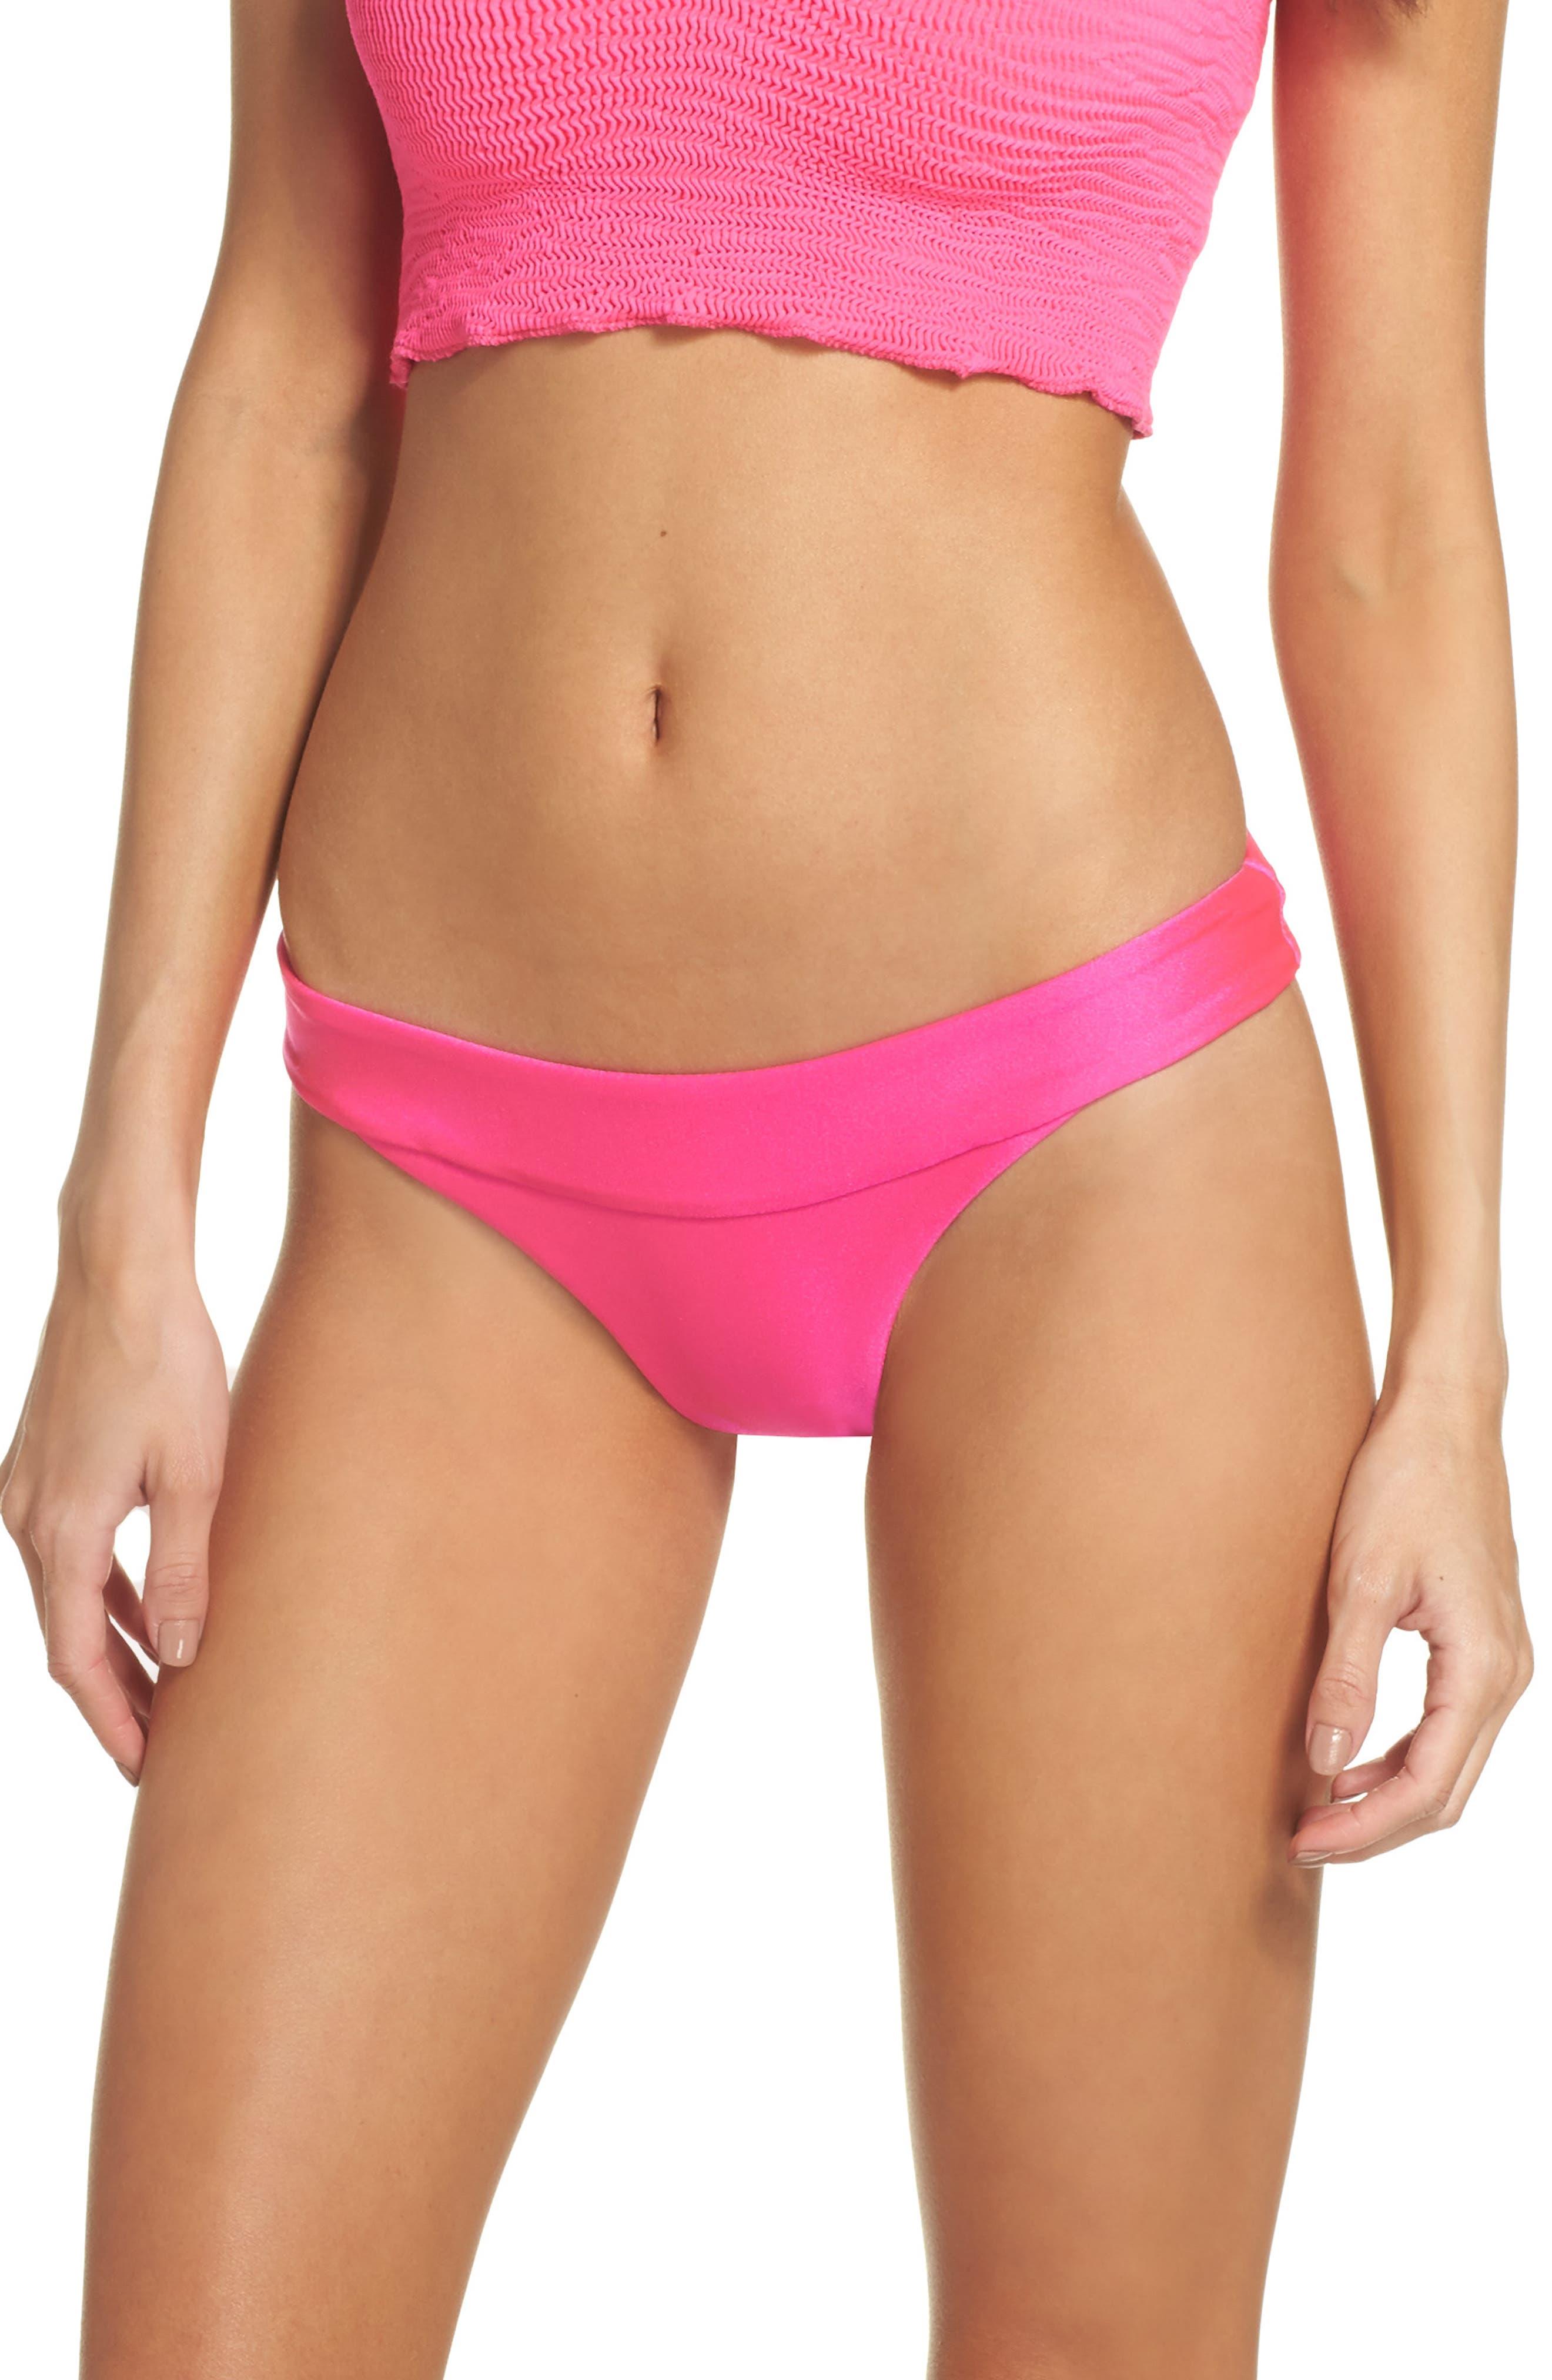 Tubular Solid Bikini Bottoms,                             Main thumbnail 1, color,                             Miami Pink